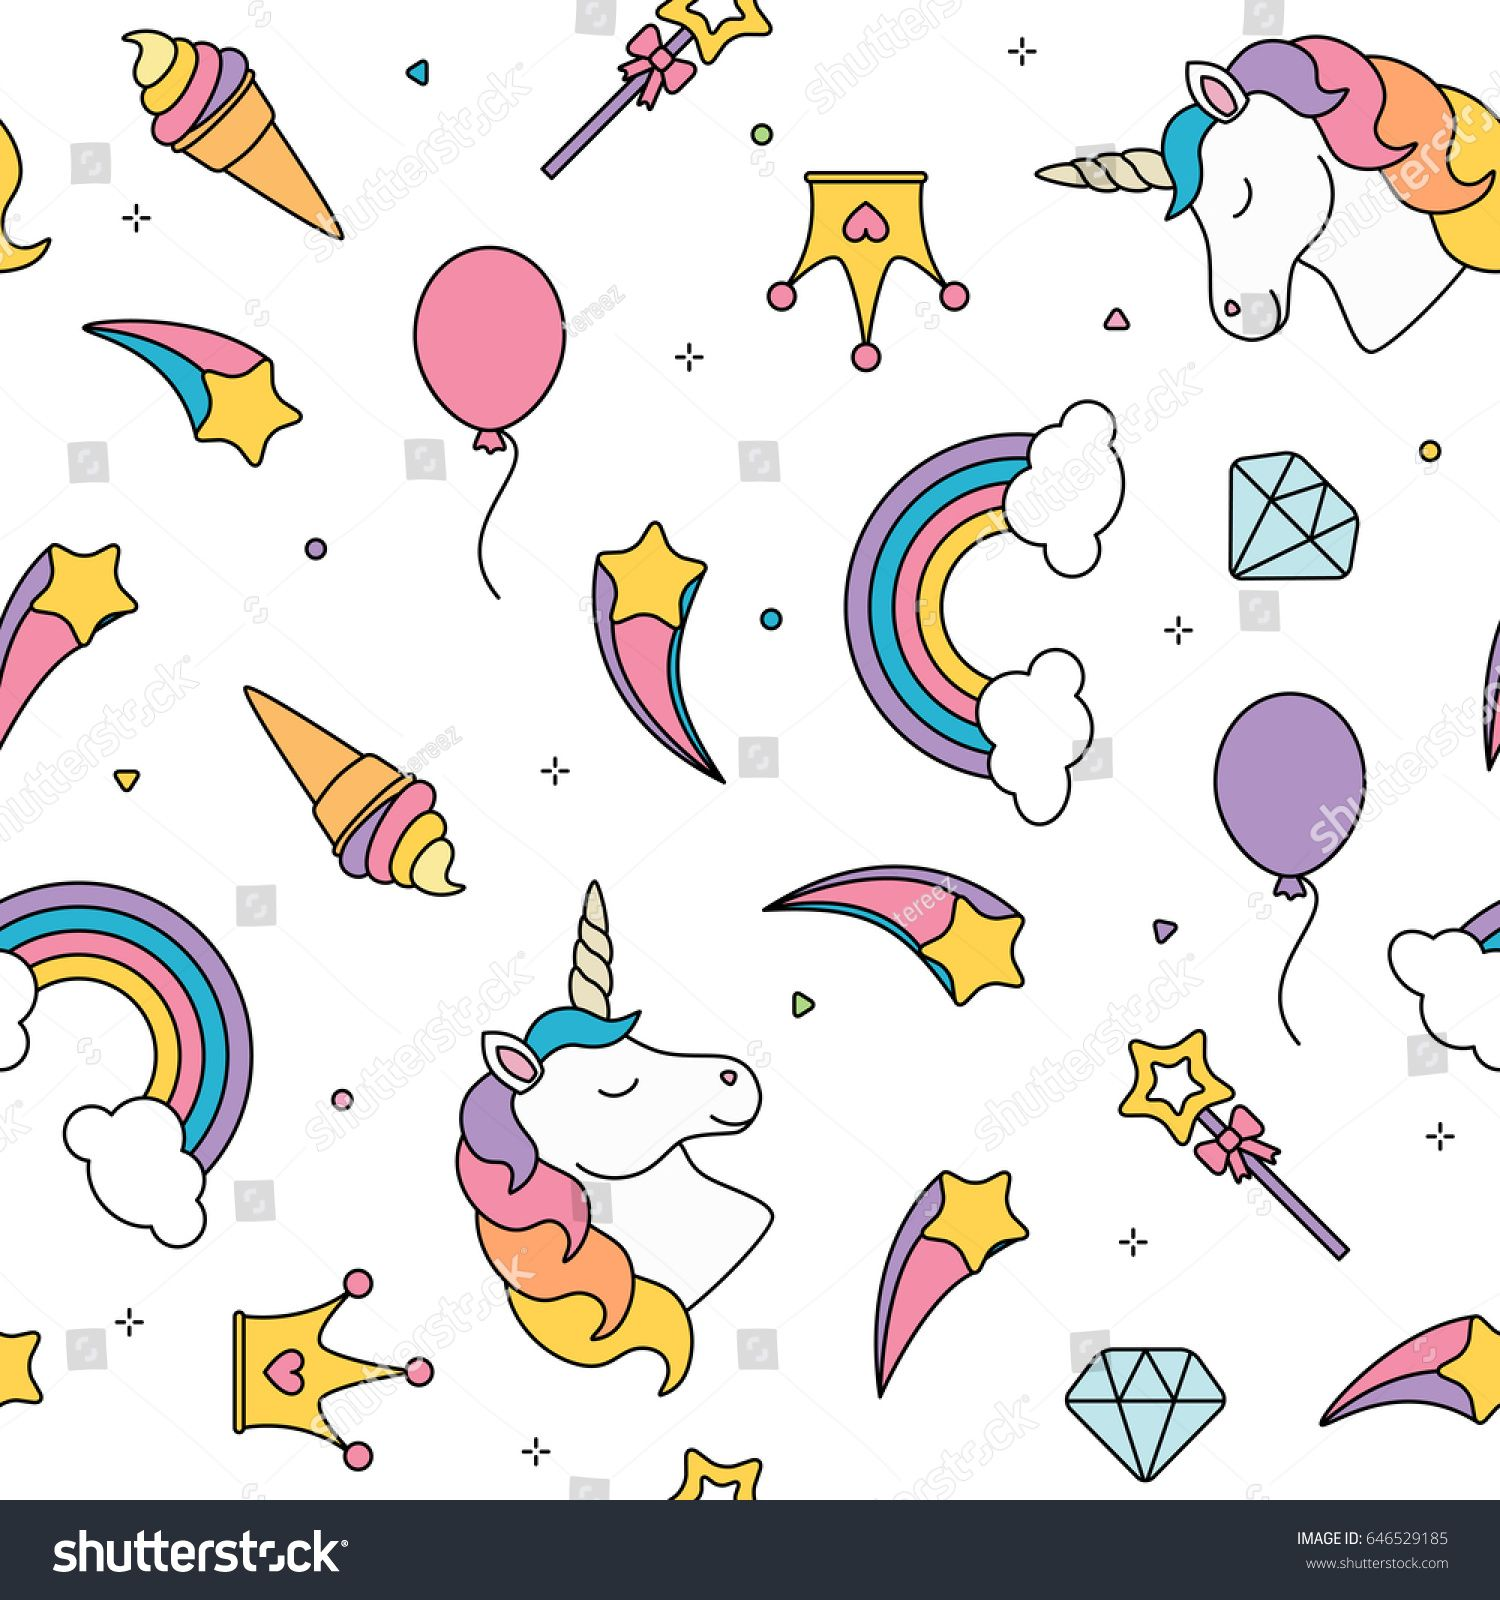 Unicorn And Rainbow Seamless Pattern Isolated On White Background